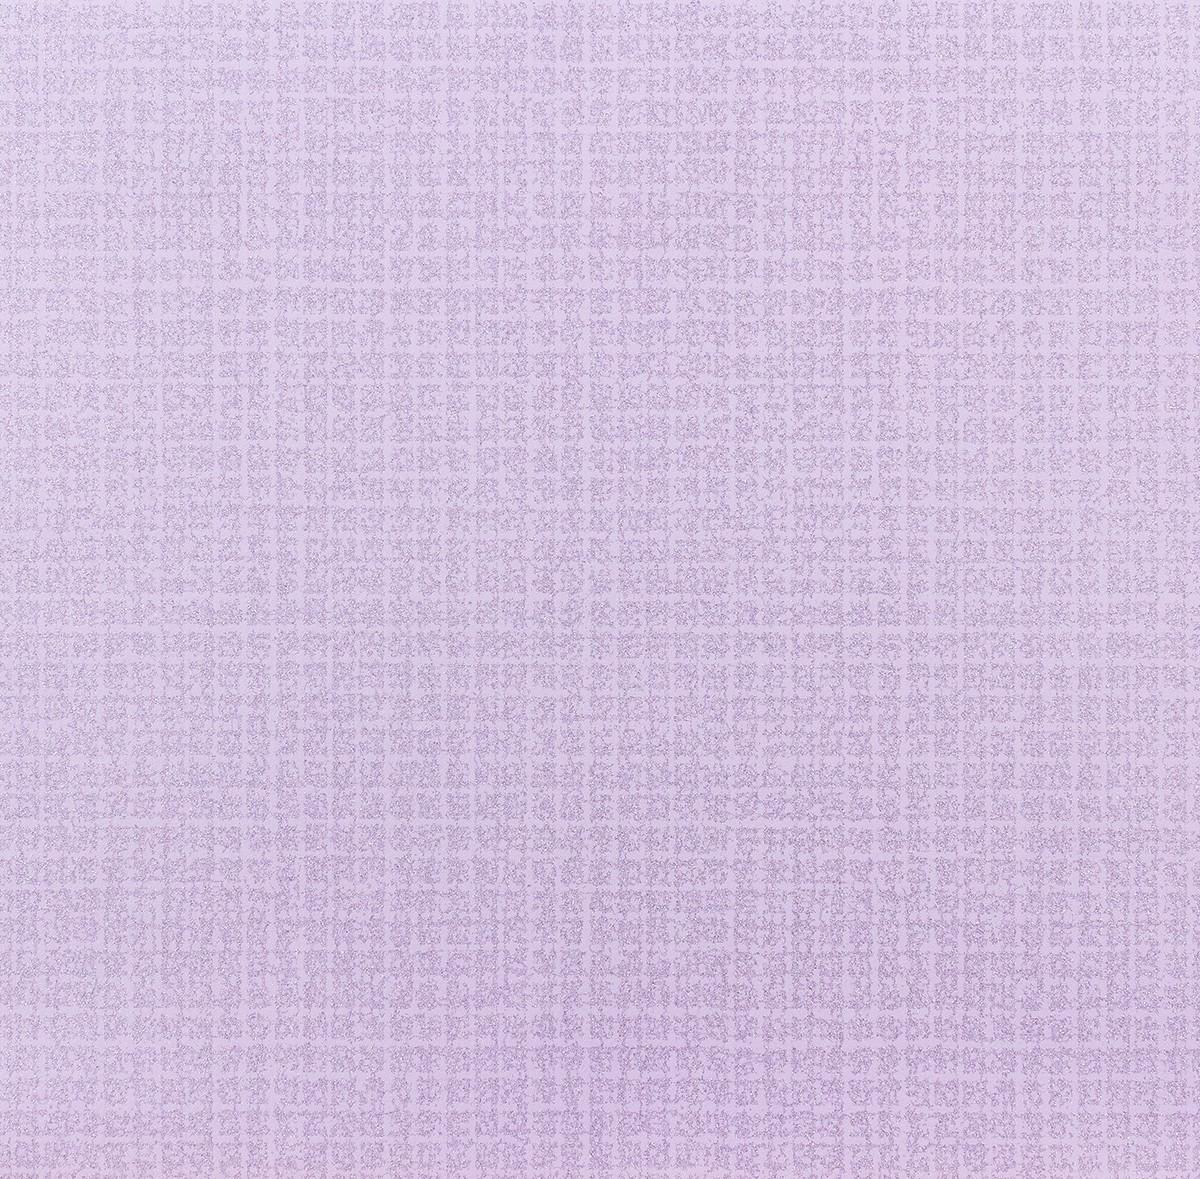 spot 2 39 tapete as vliestapete design 93827 4 938274 uni kariert lila glitzer 3 ebay. Black Bedroom Furniture Sets. Home Design Ideas